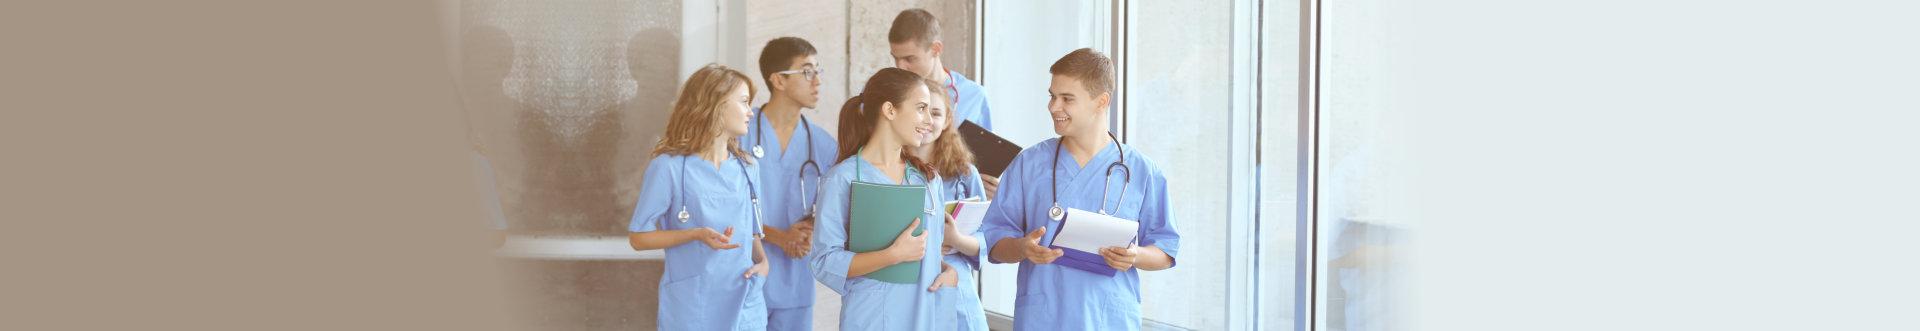 young practical nurses